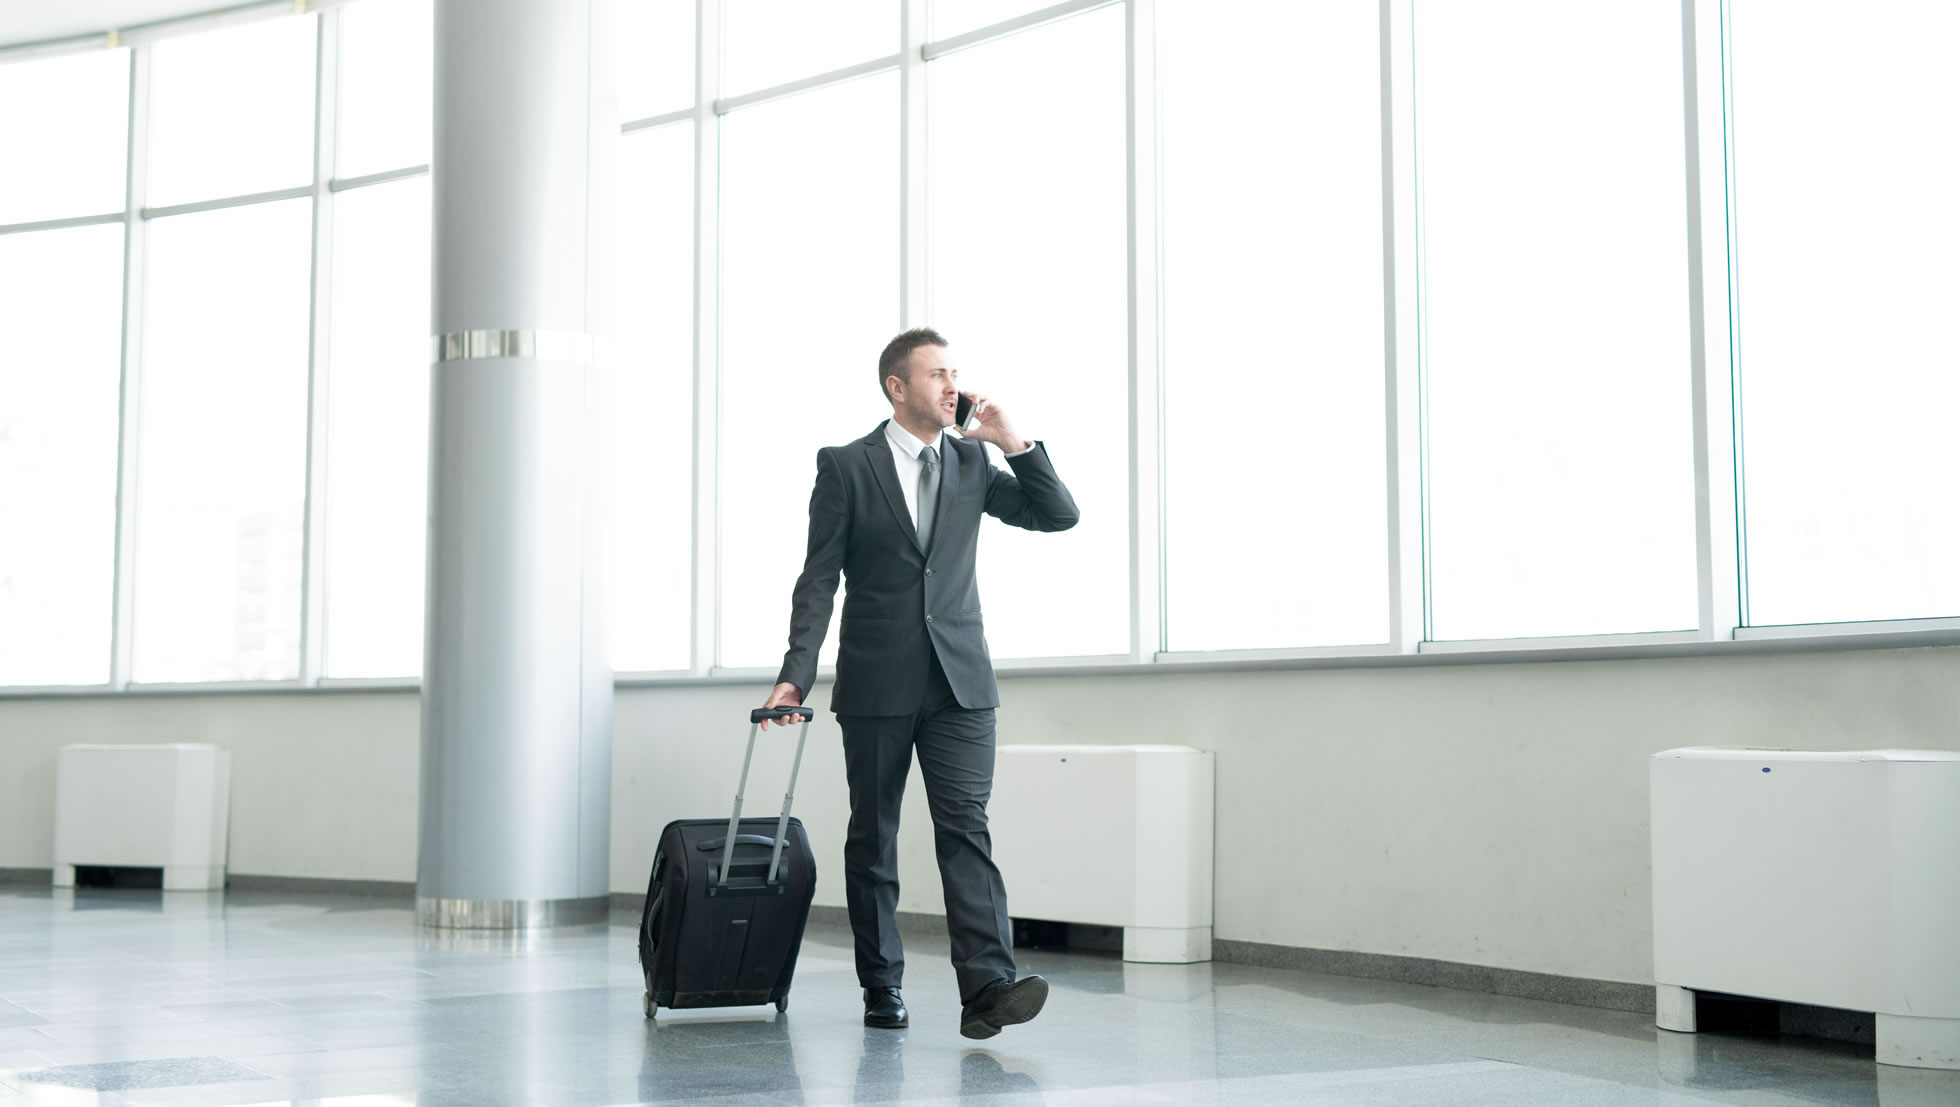 http://www.business-travel-btm.com/wp-content/uploads/2021/05/Business-Travel-20-BTM-Business-Travel-Management.jpg